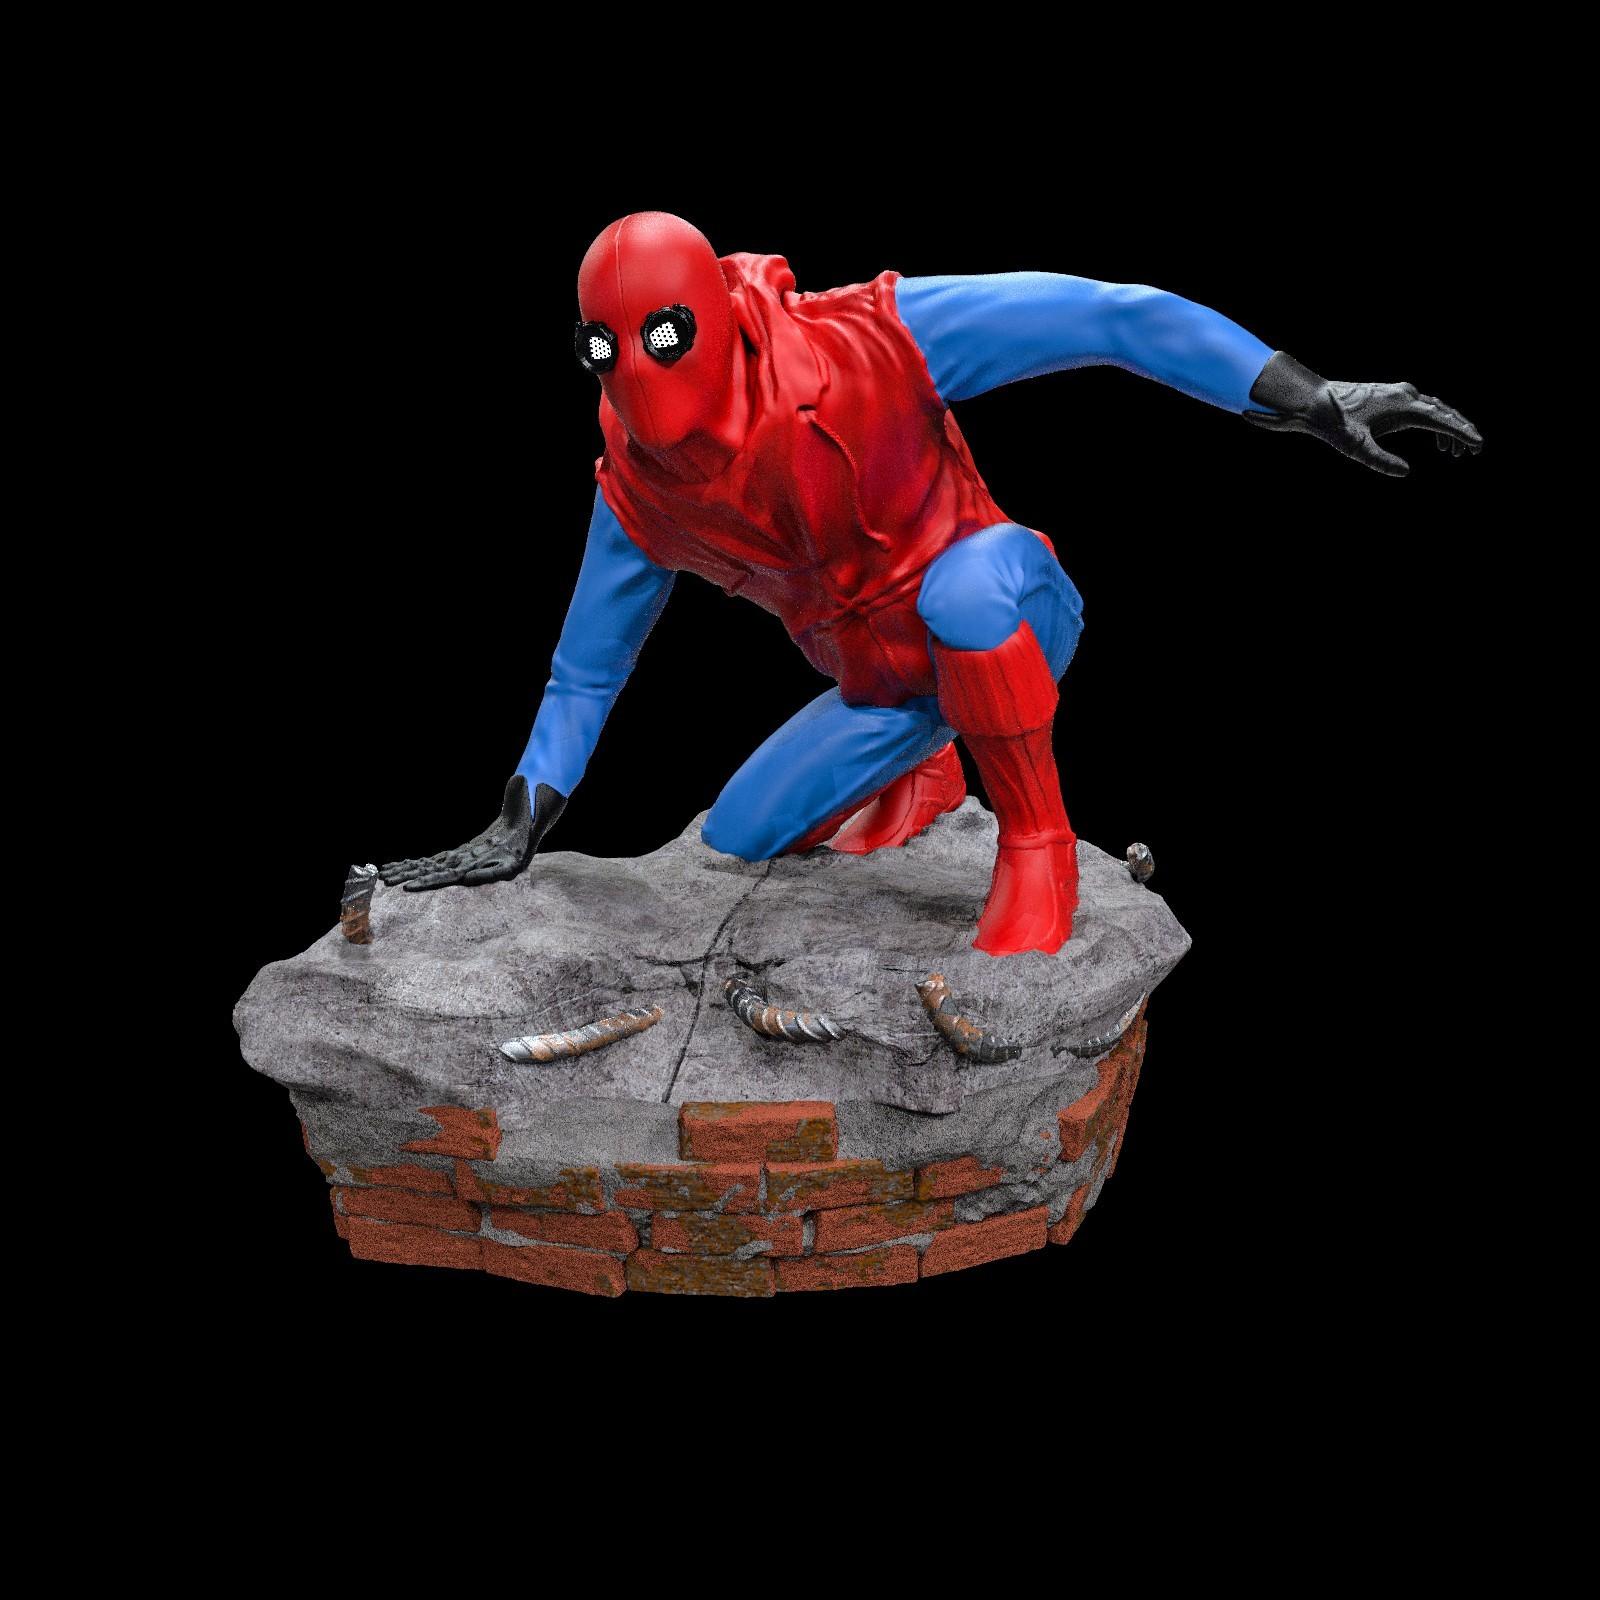 16.jpg Download STL file Spider-Man Homemade Suit • Design to 3D print, tolgaaxu